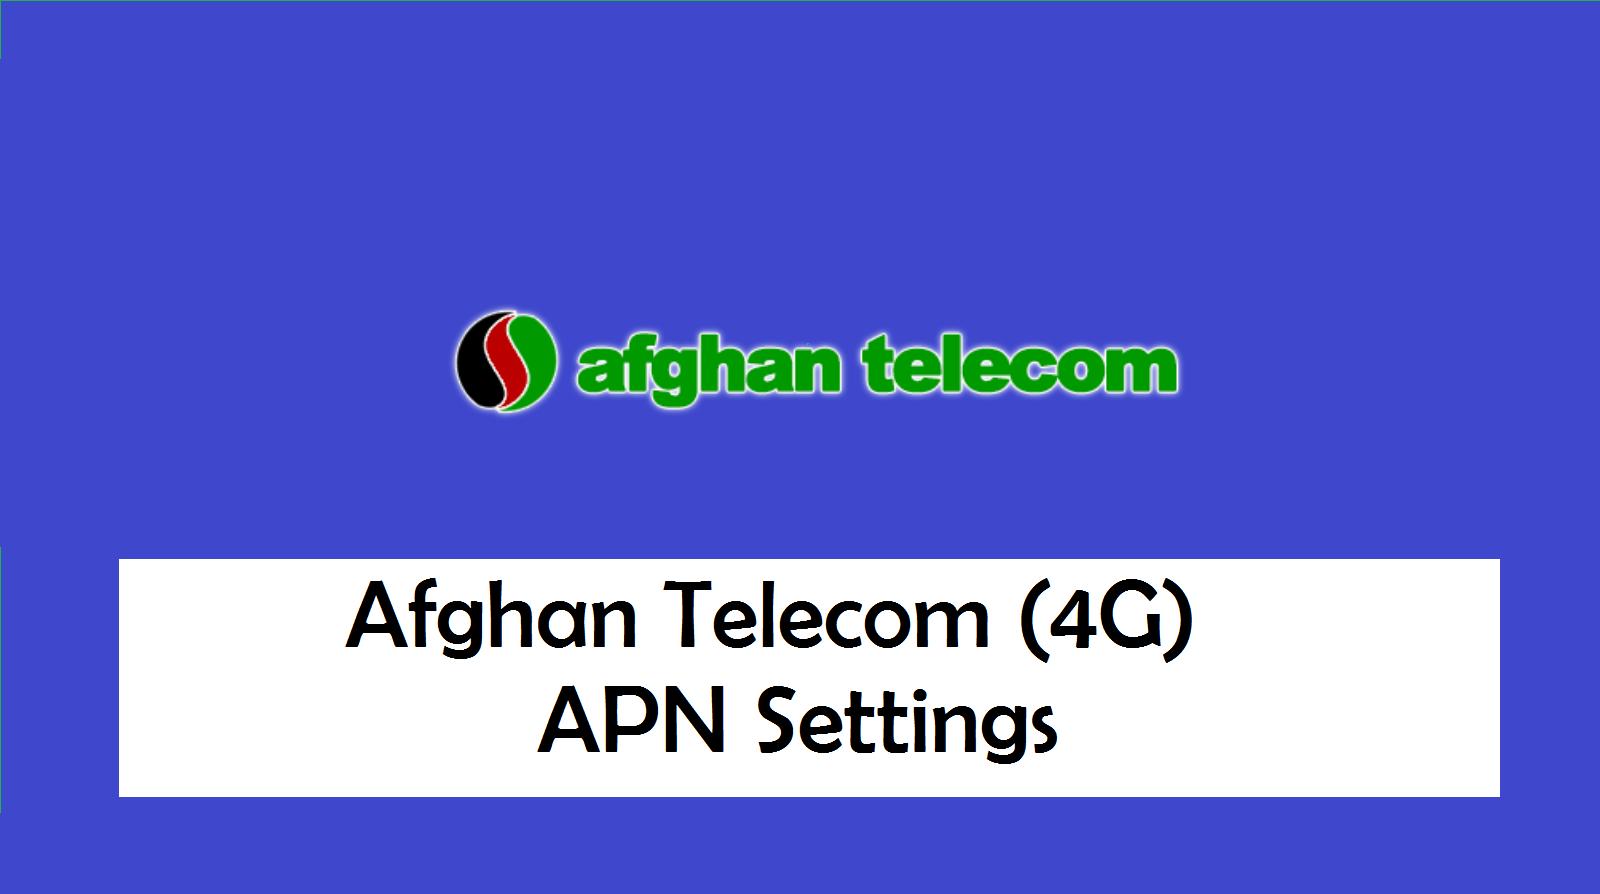 Afghan Telecom (4G) APN Settings